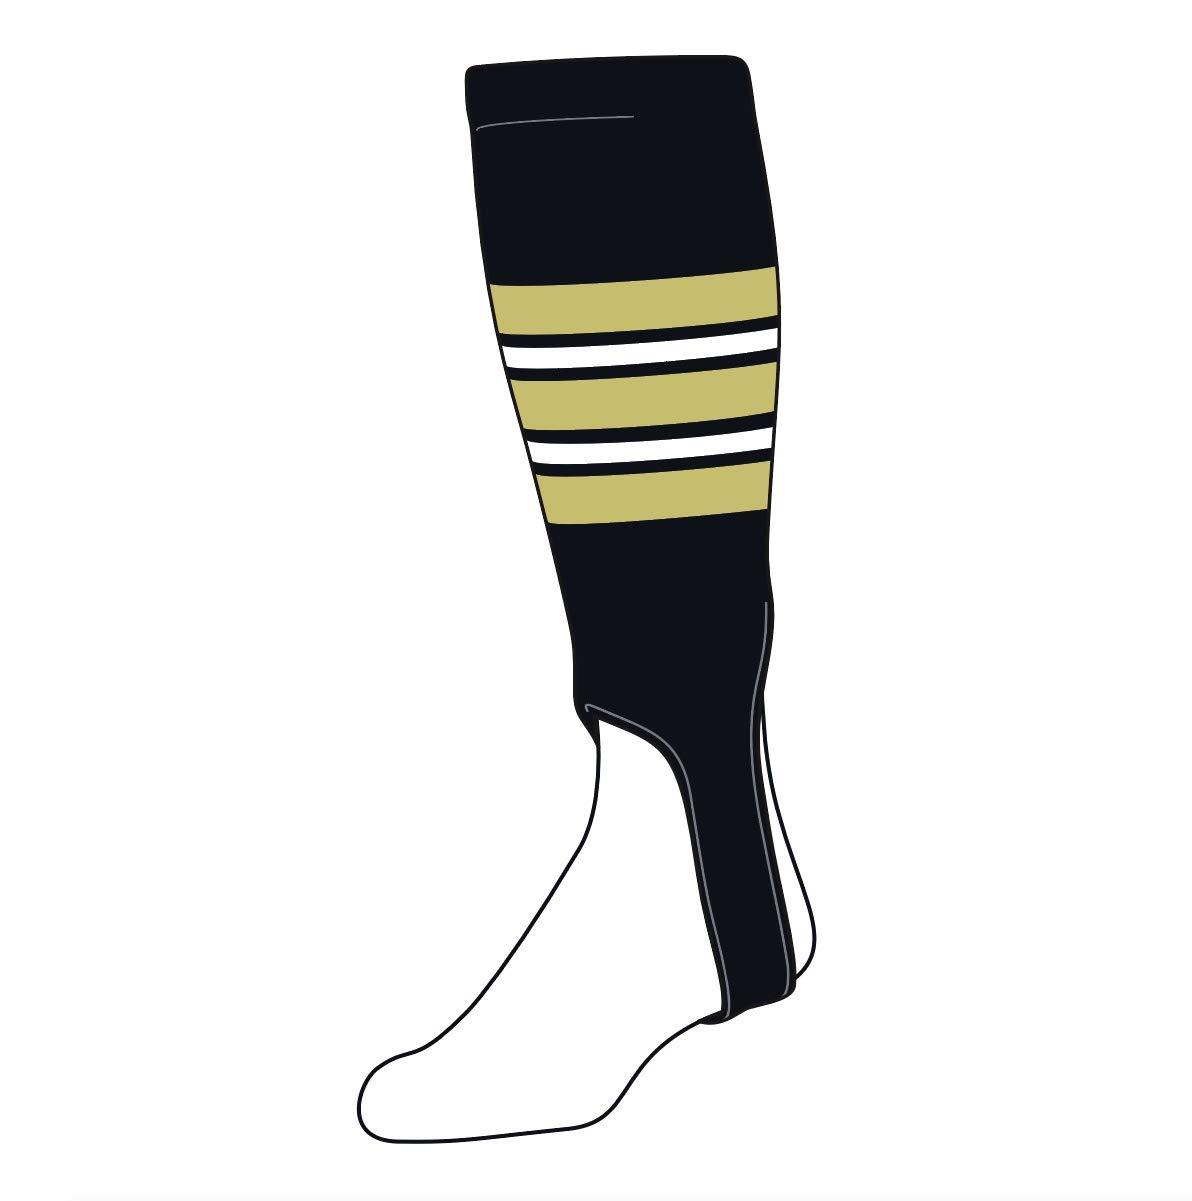 TCK Baseball Stirrups Large PRO (700F, 5in) Black, Vegas Gold, White by TCK Socks